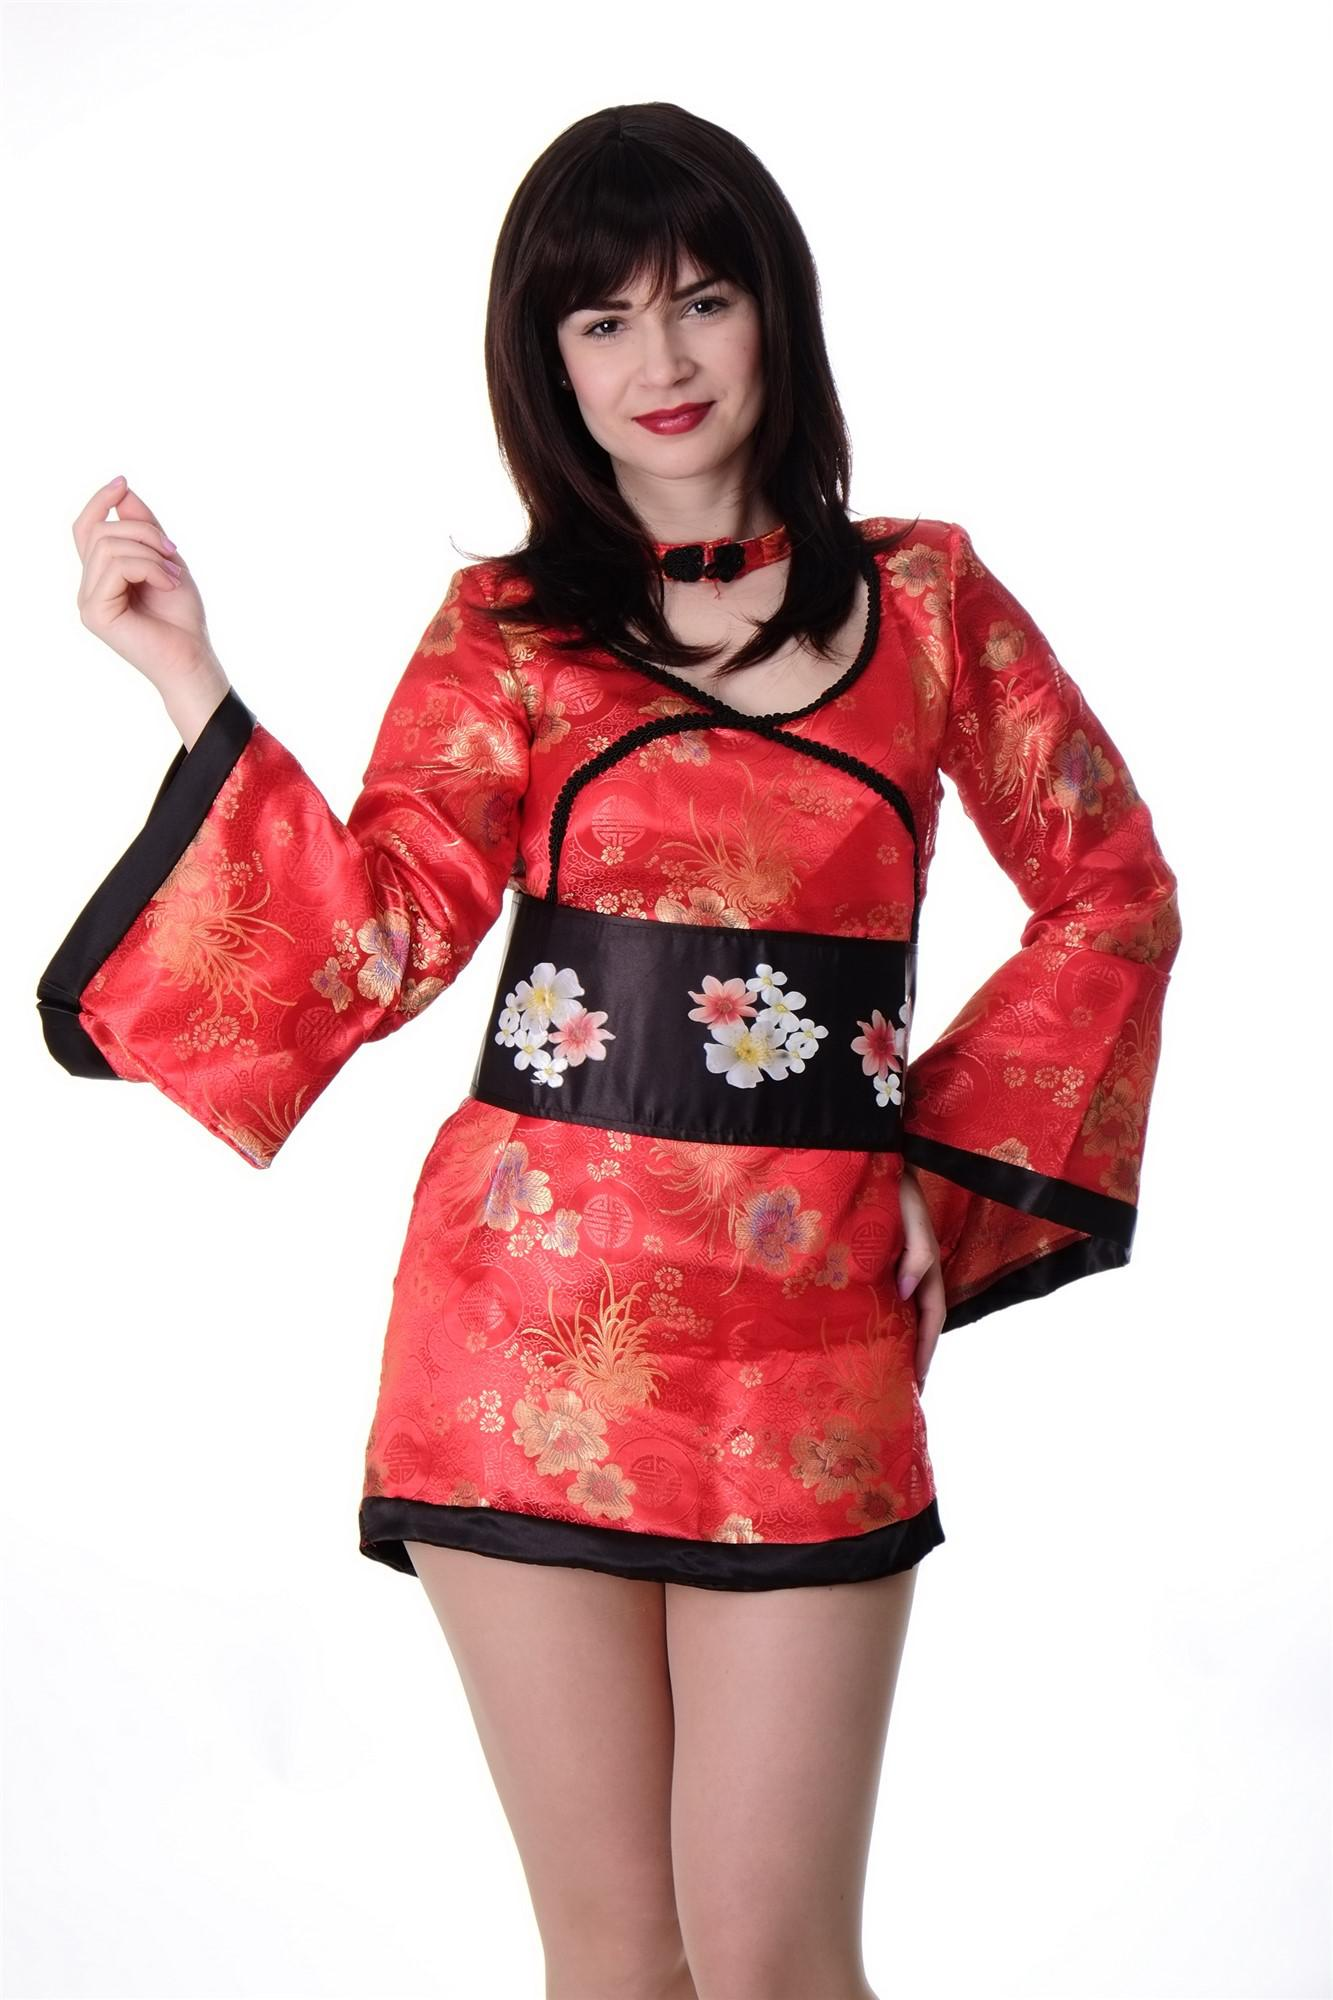 dress me up kost m damen damenkost m china girl geisha kimono kurtisane gr s m kaufen bei vk. Black Bedroom Furniture Sets. Home Design Ideas